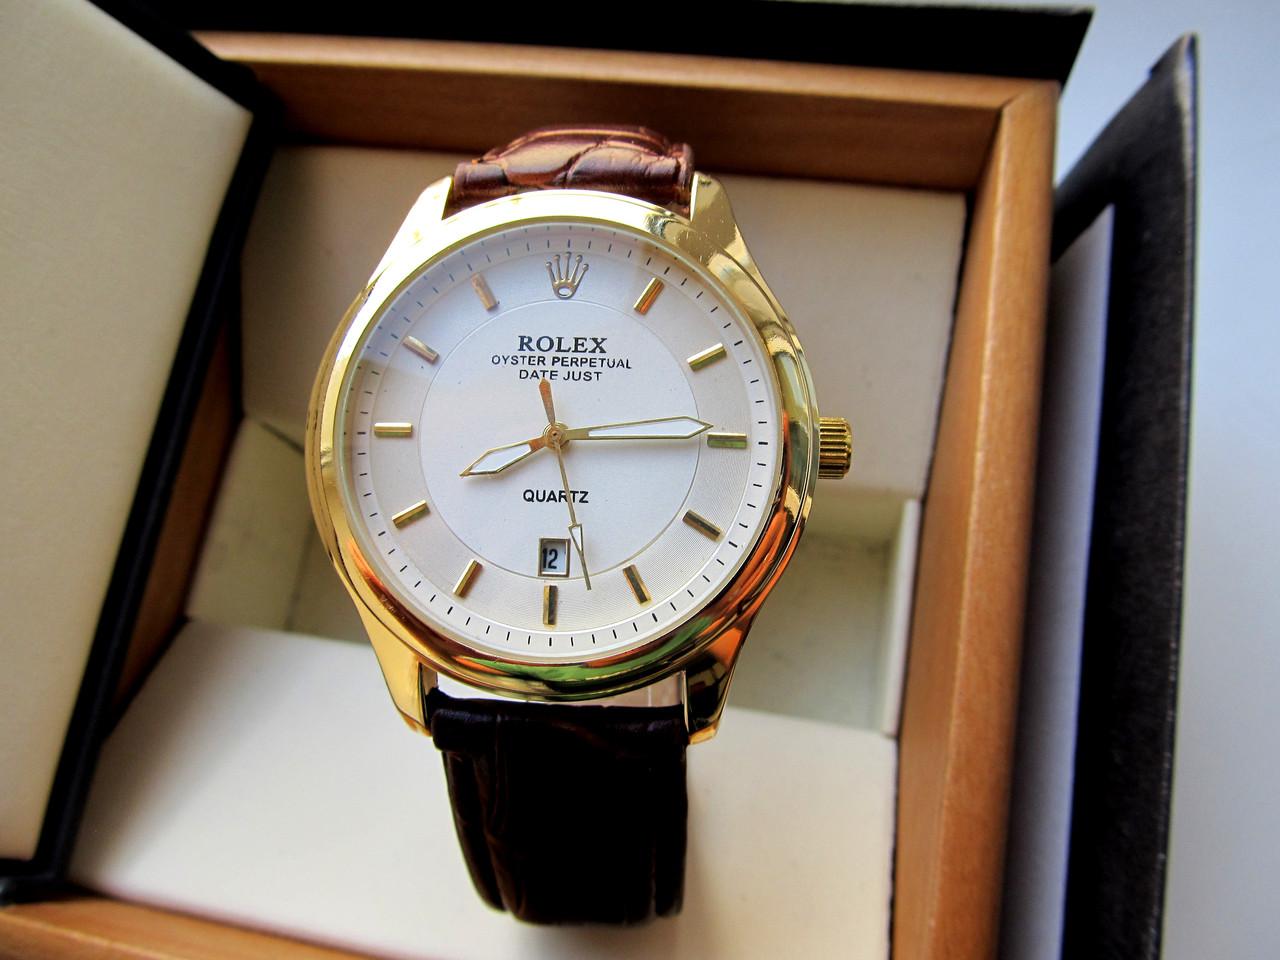 Часы Rolex Daytona мужские кварц оптом